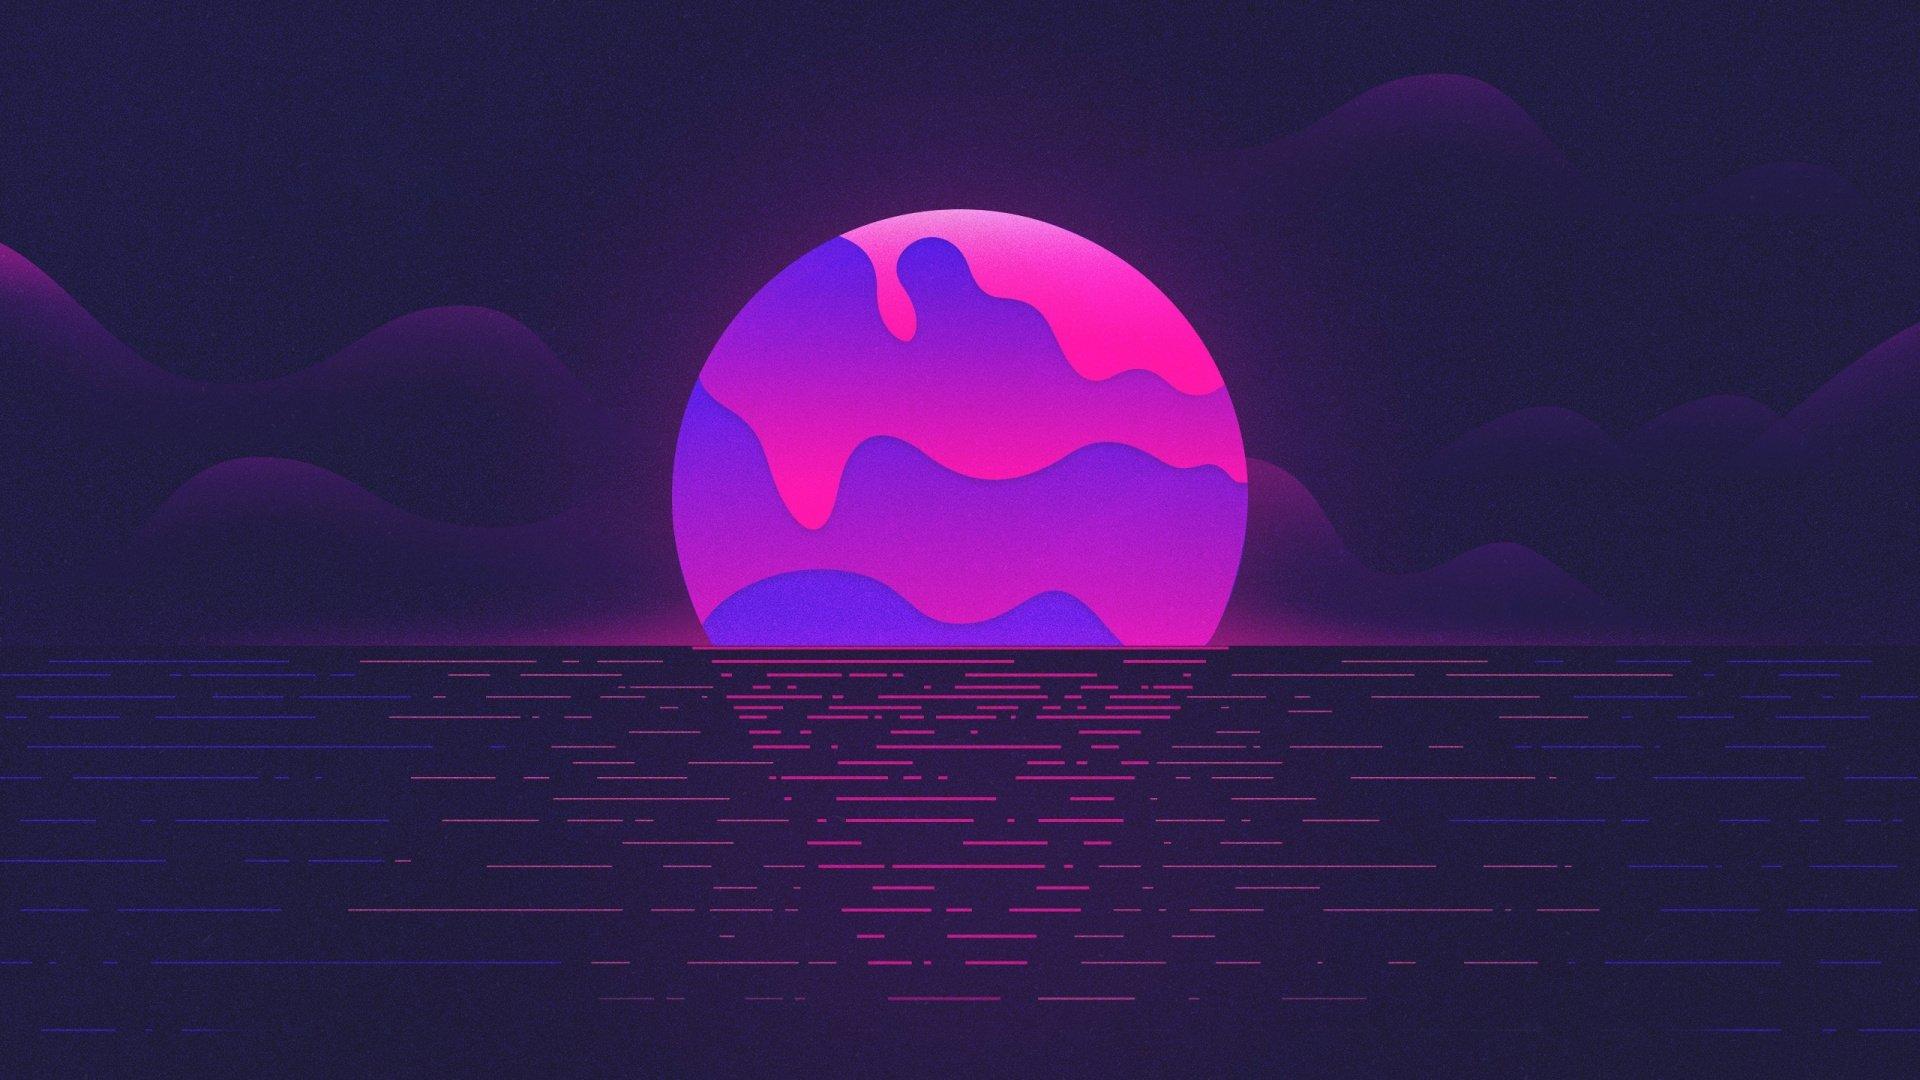 Aesthetic Moon Wallpaper Pic